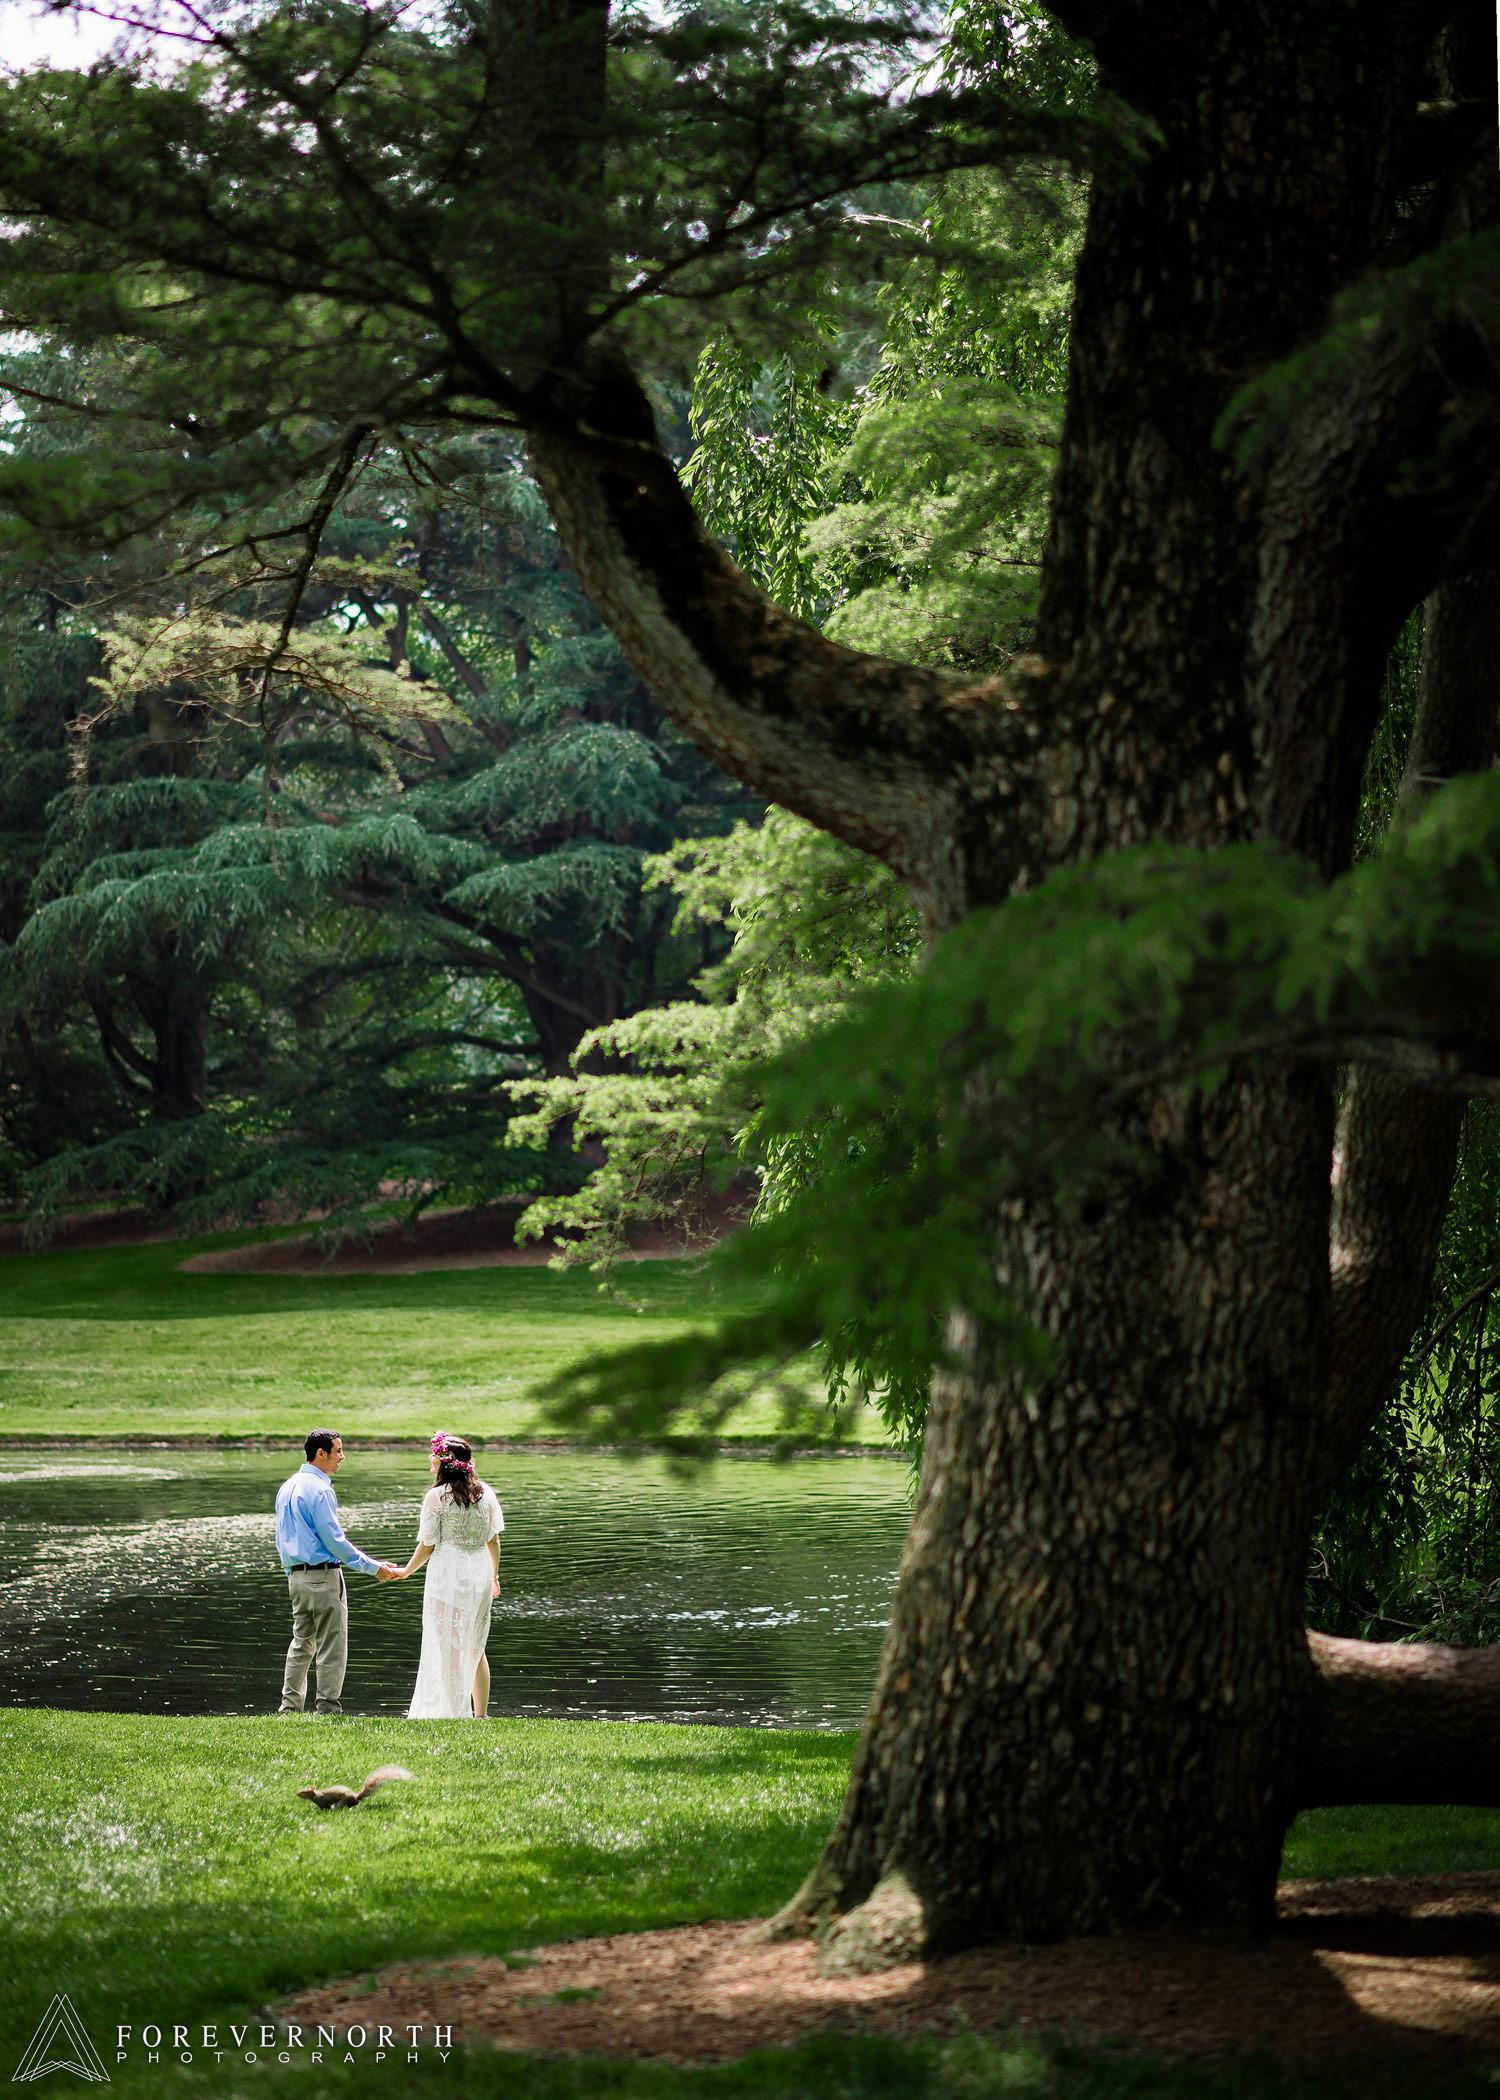 Rivera-Longwood-Gardens-Chester-Pennsylvania-Wedding-Photographer-02.JPG